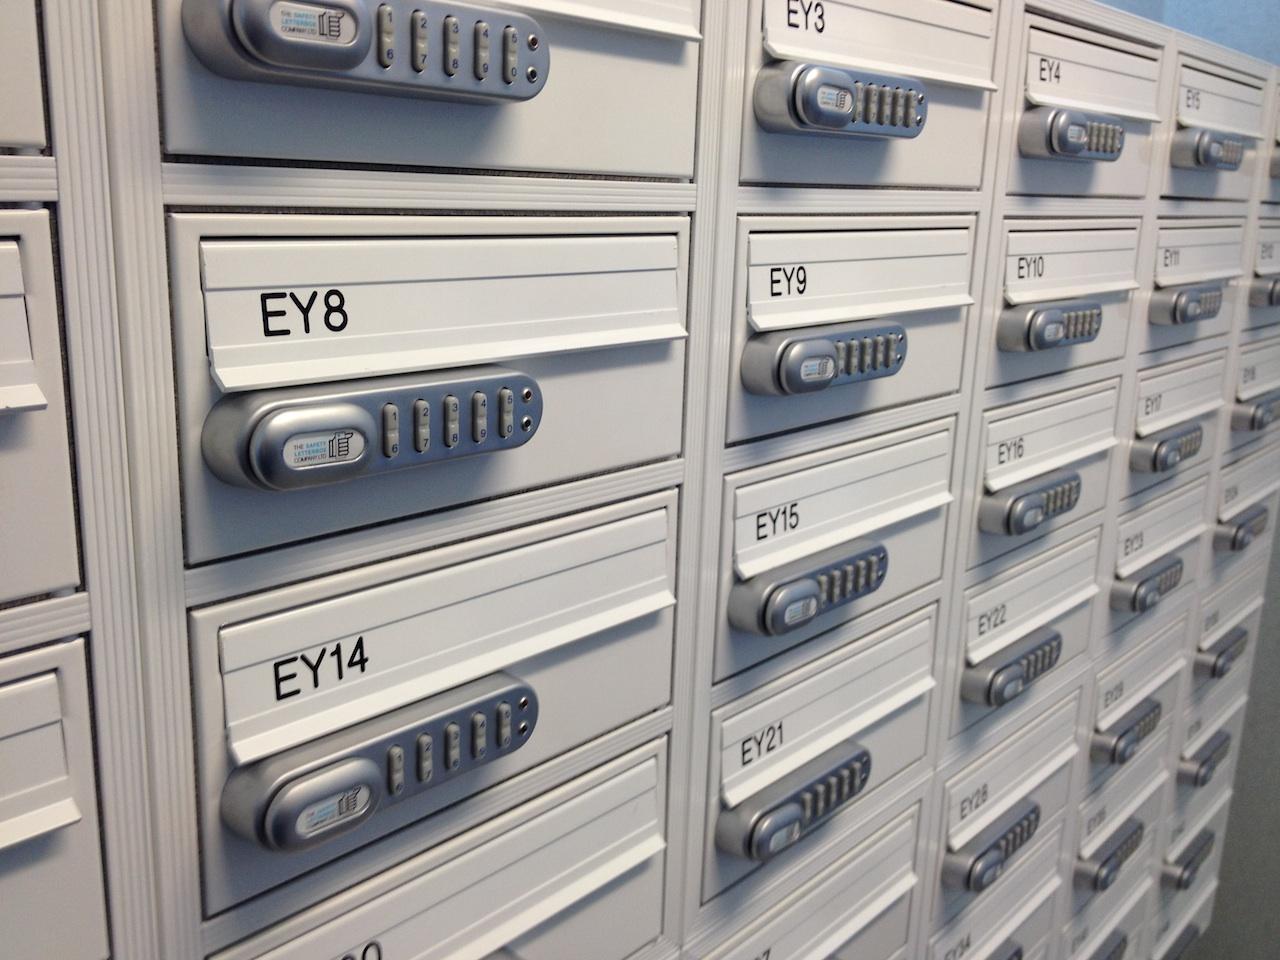 KitLock The Keyless Digital Lock For Securing Mail